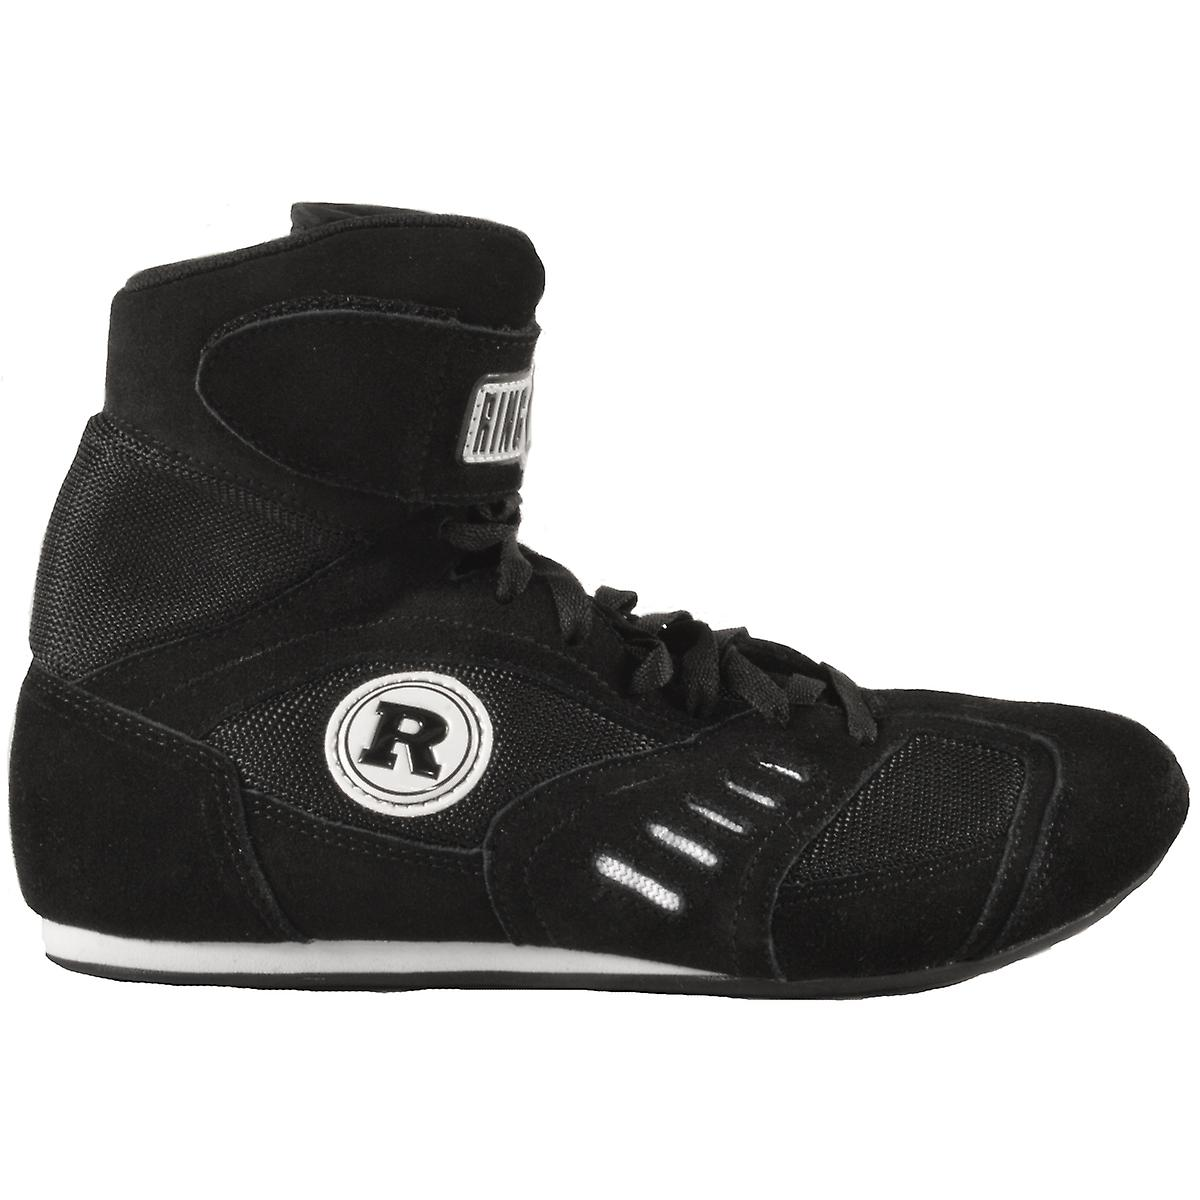 Am Ring macht Boxen Schuhe - Schwarz